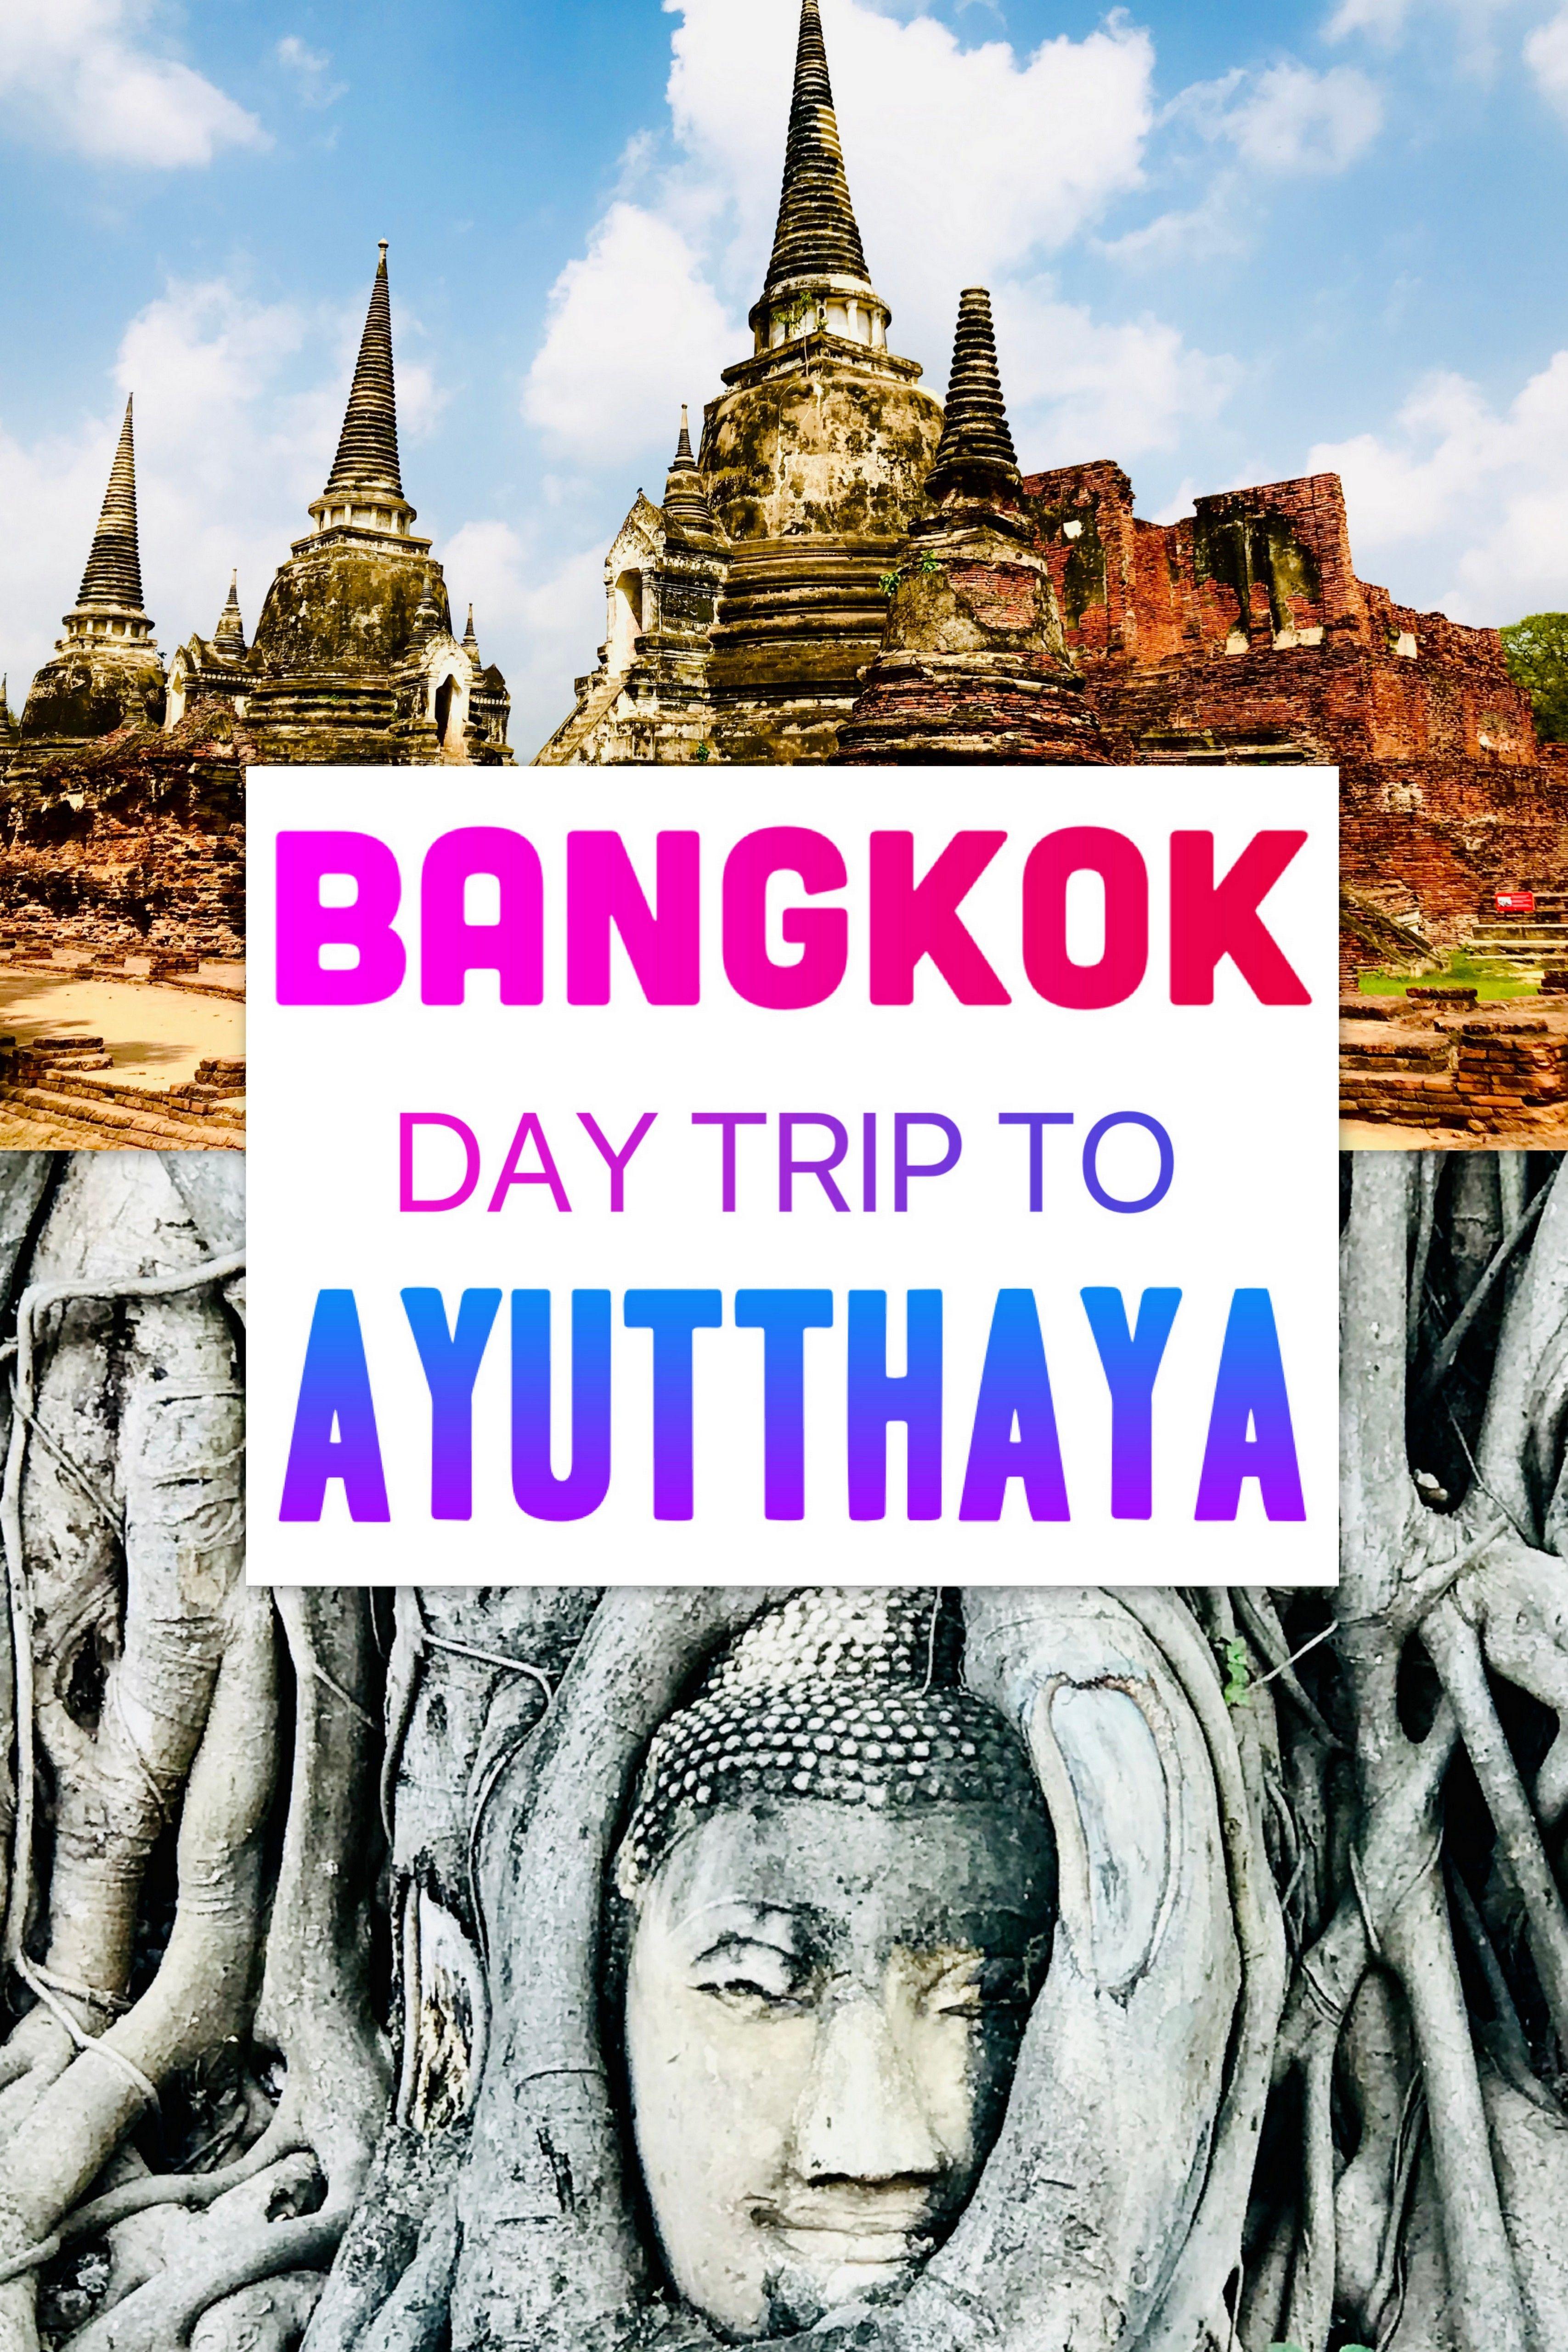 930bcd43aedb7da375c5ea8c36b24560 - How Do I Get From Bangkok To Ayutthaya By Train